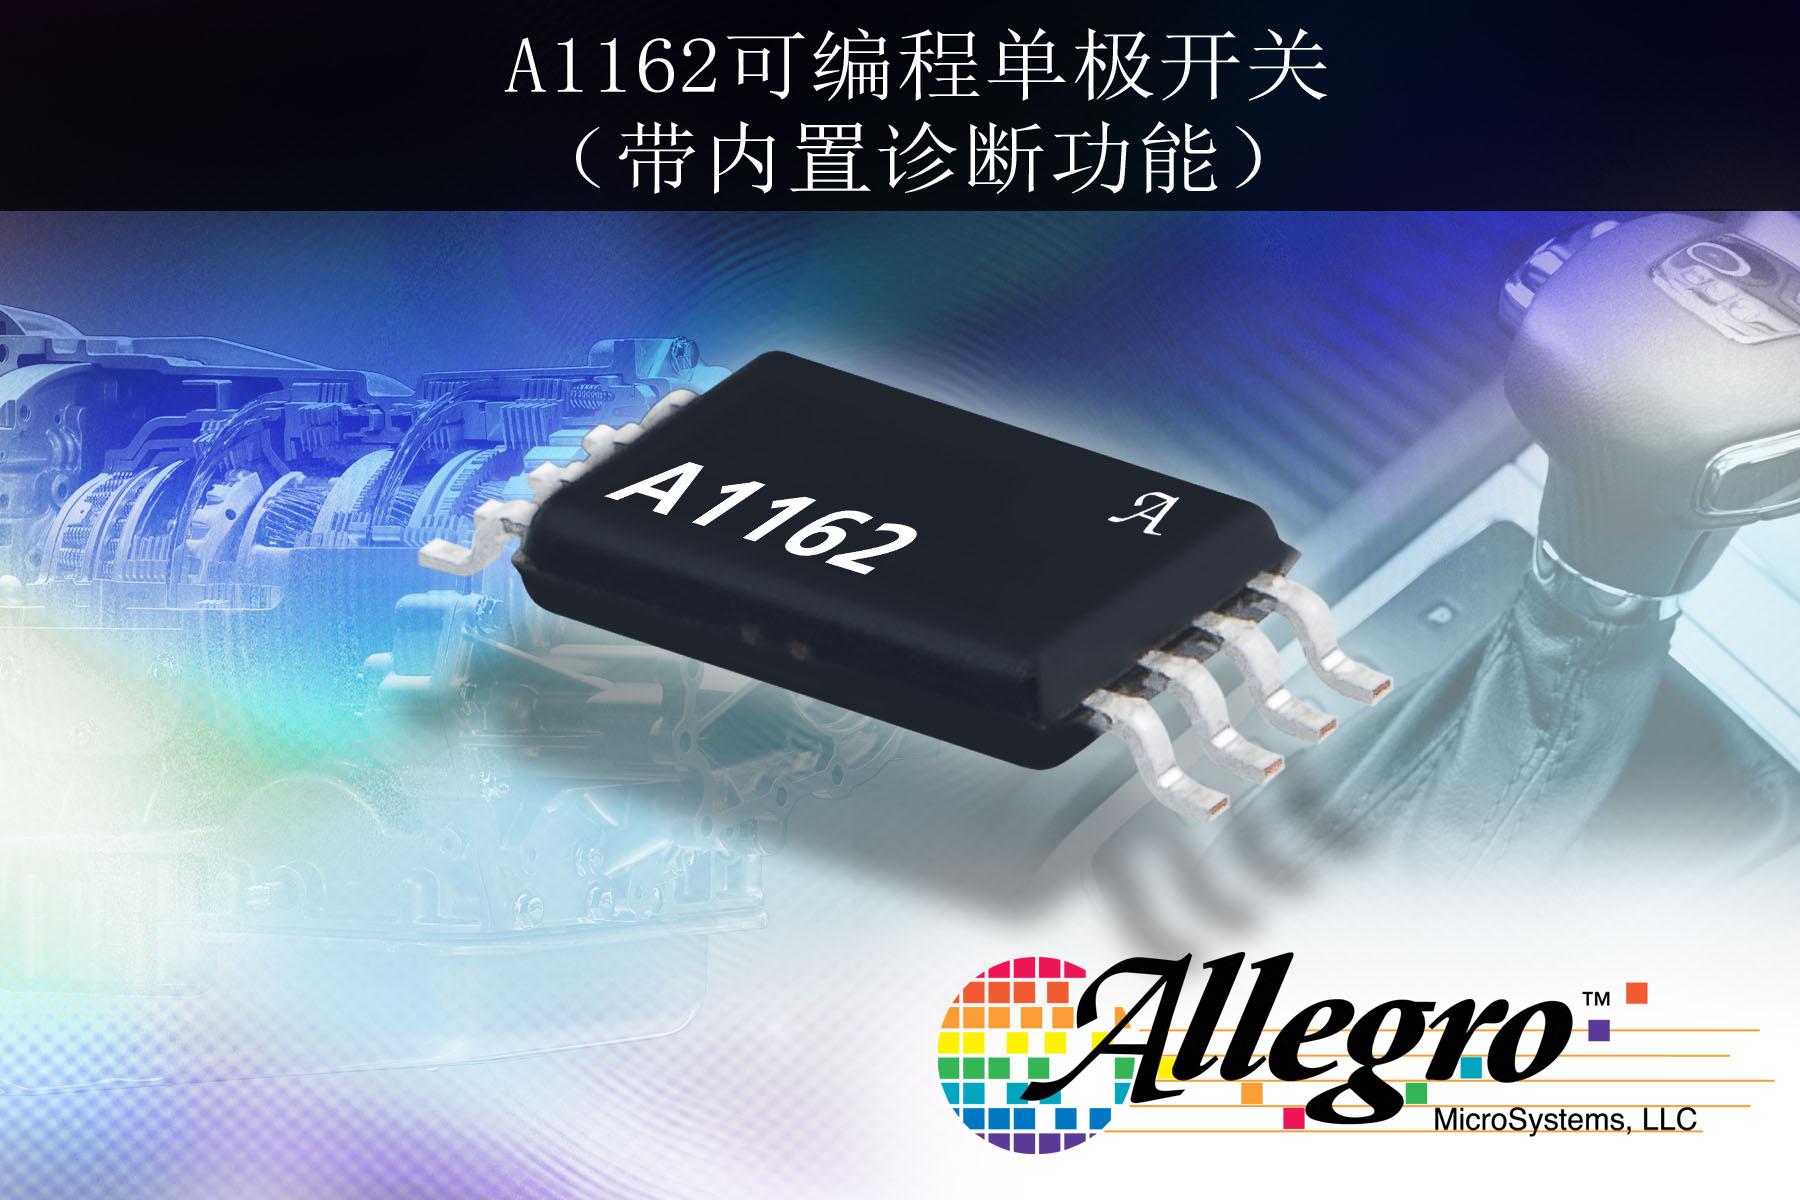 Allegro MicroSystems, LLC发布全新可编程单极霍尔效应开关